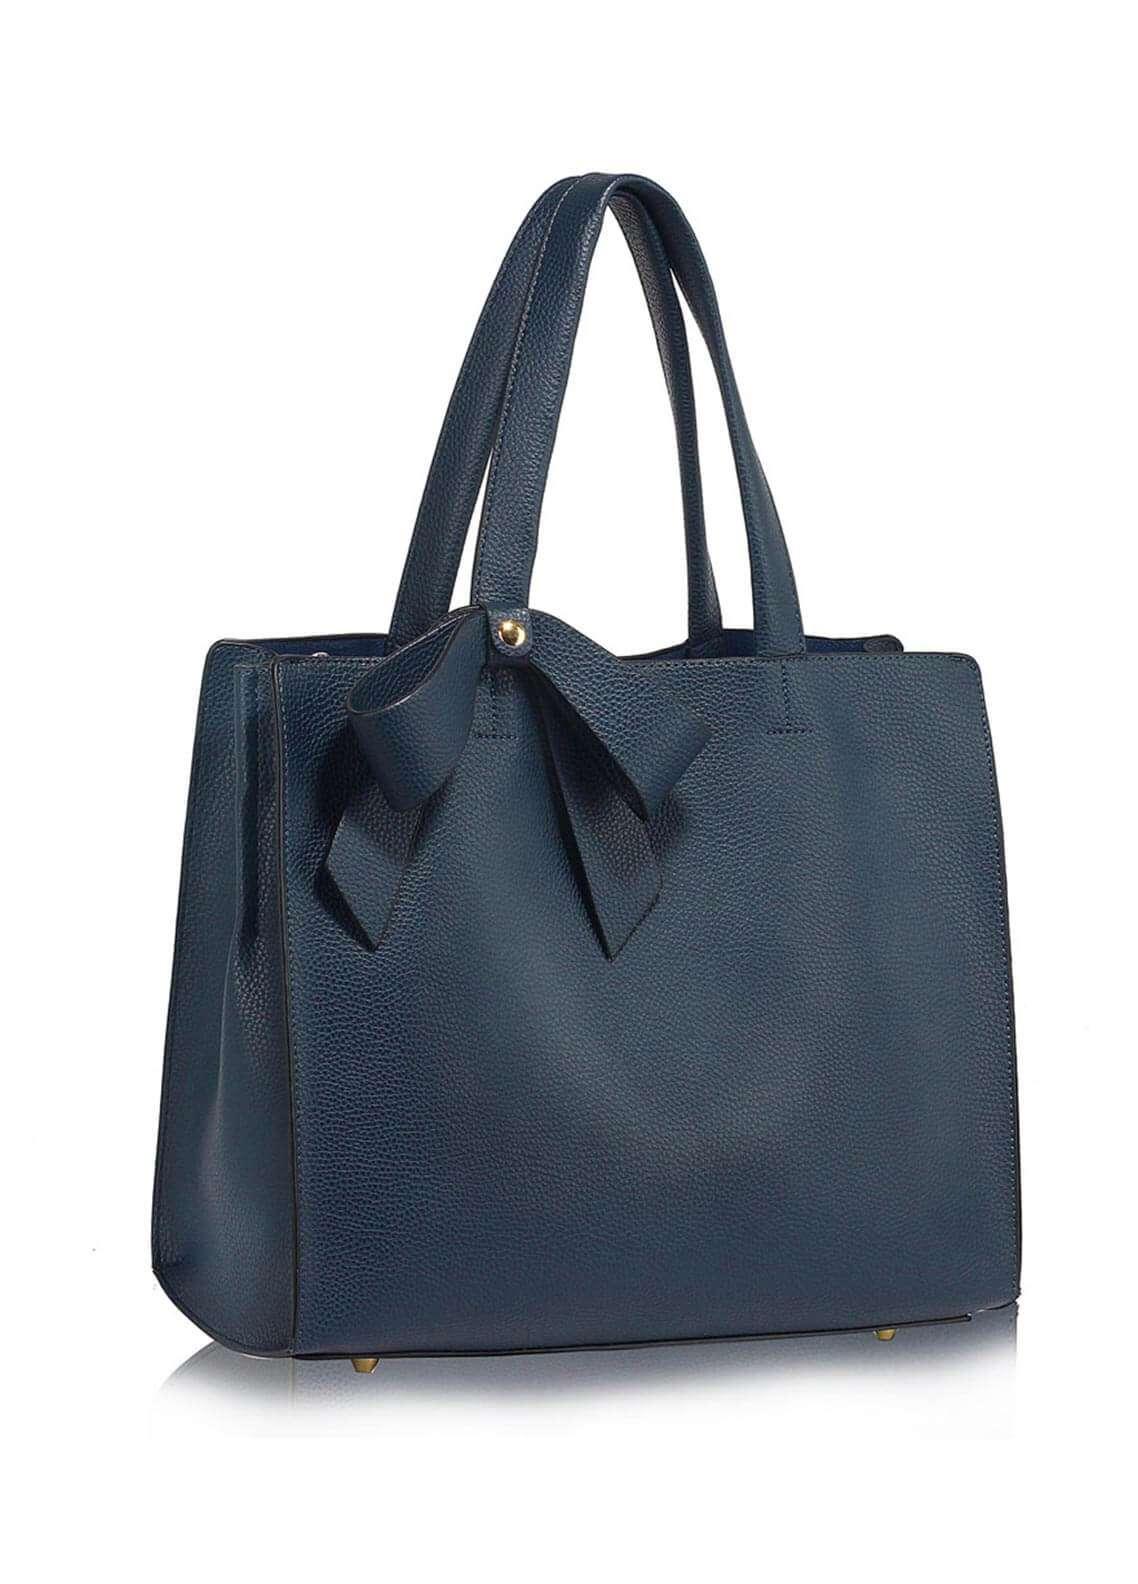 Leesun London  Faux Leather Shoulder  Bags for Woman - Navy Blue